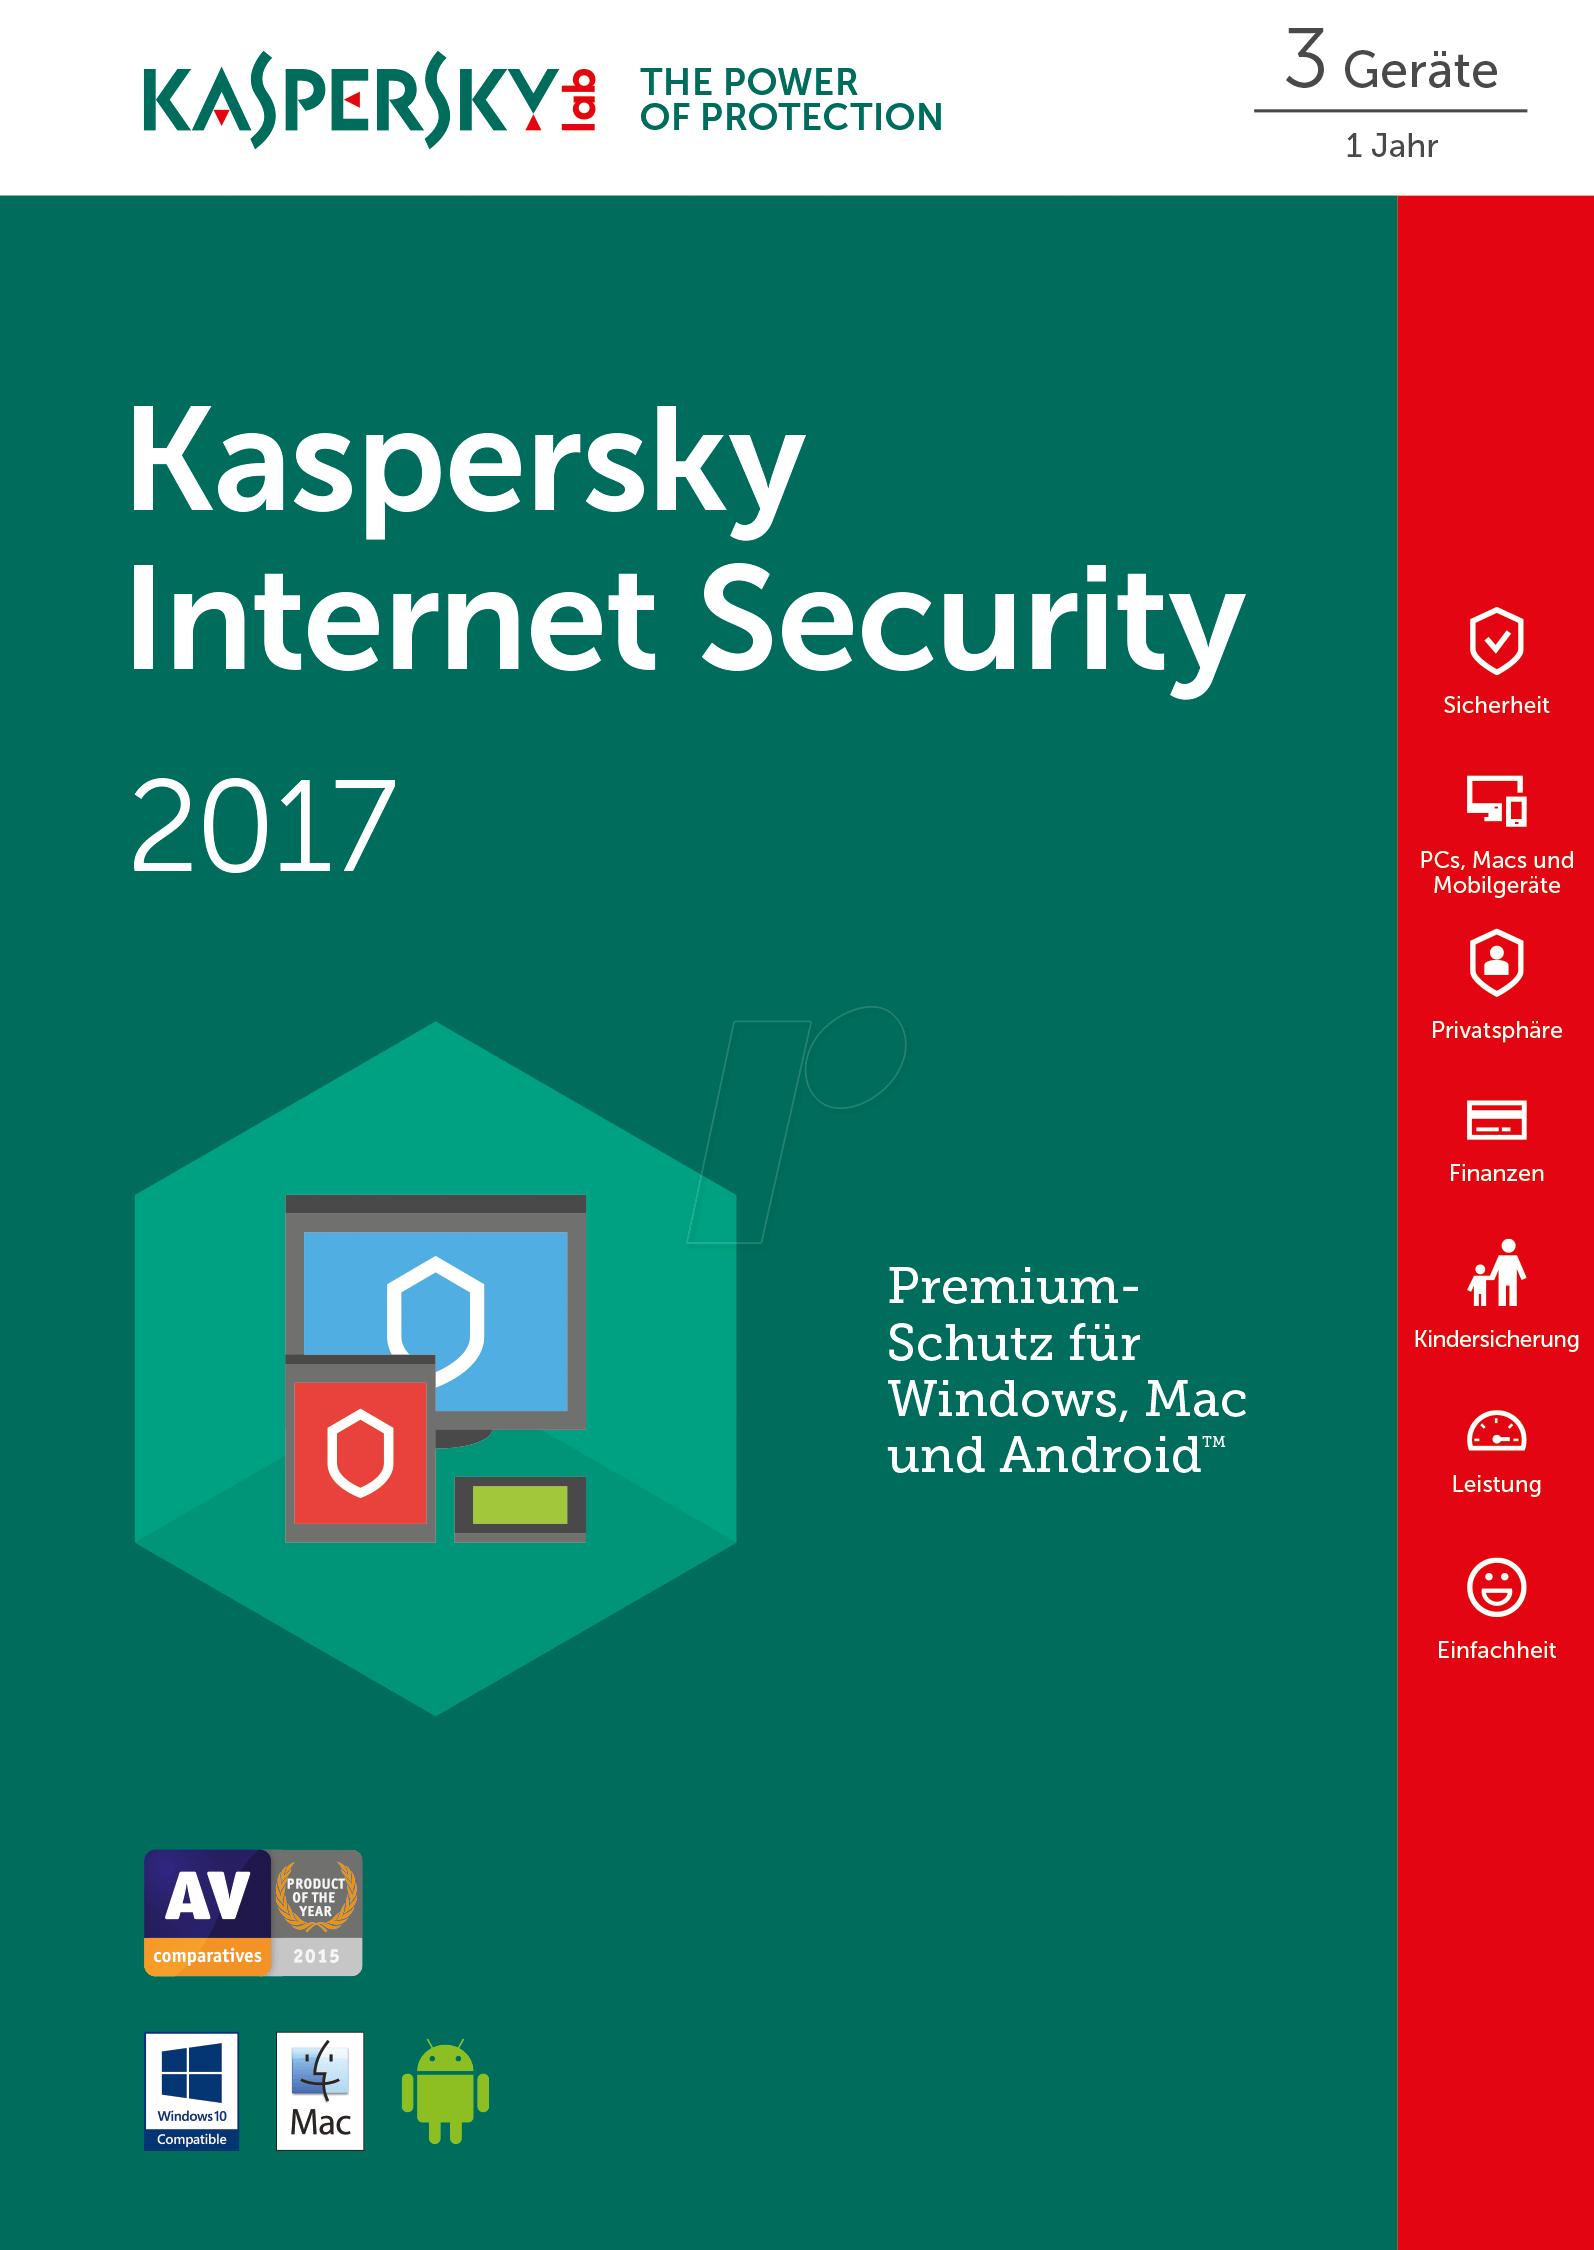 https://cdn-reichelt.de/bilder/web/xxl_ws/G500/KASPERSKY_IS2017_3U_02.png